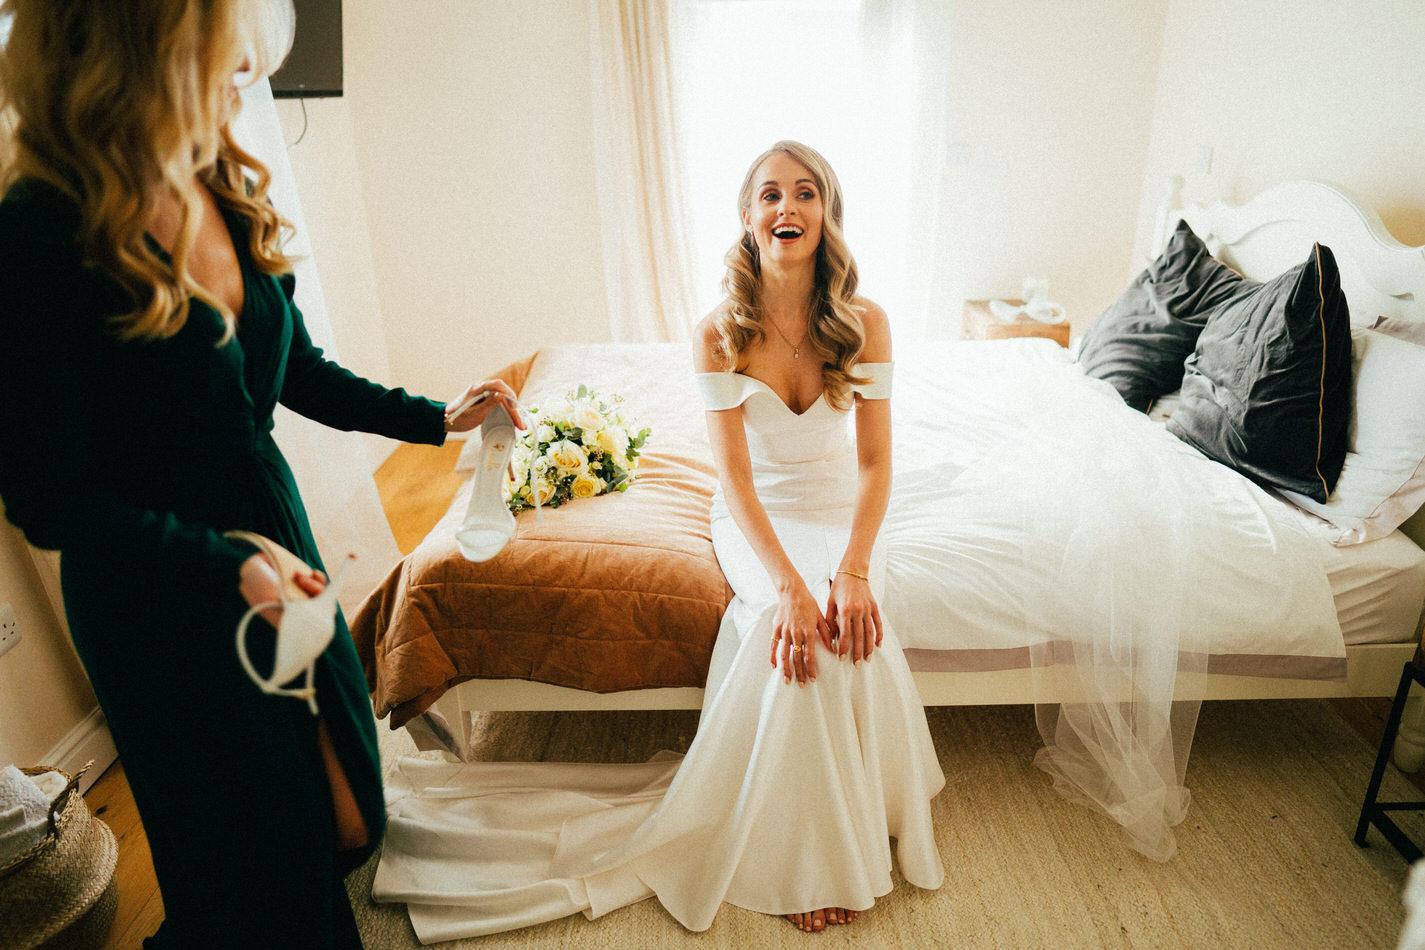 Castle-wedding-ireland-photos- 0061 43